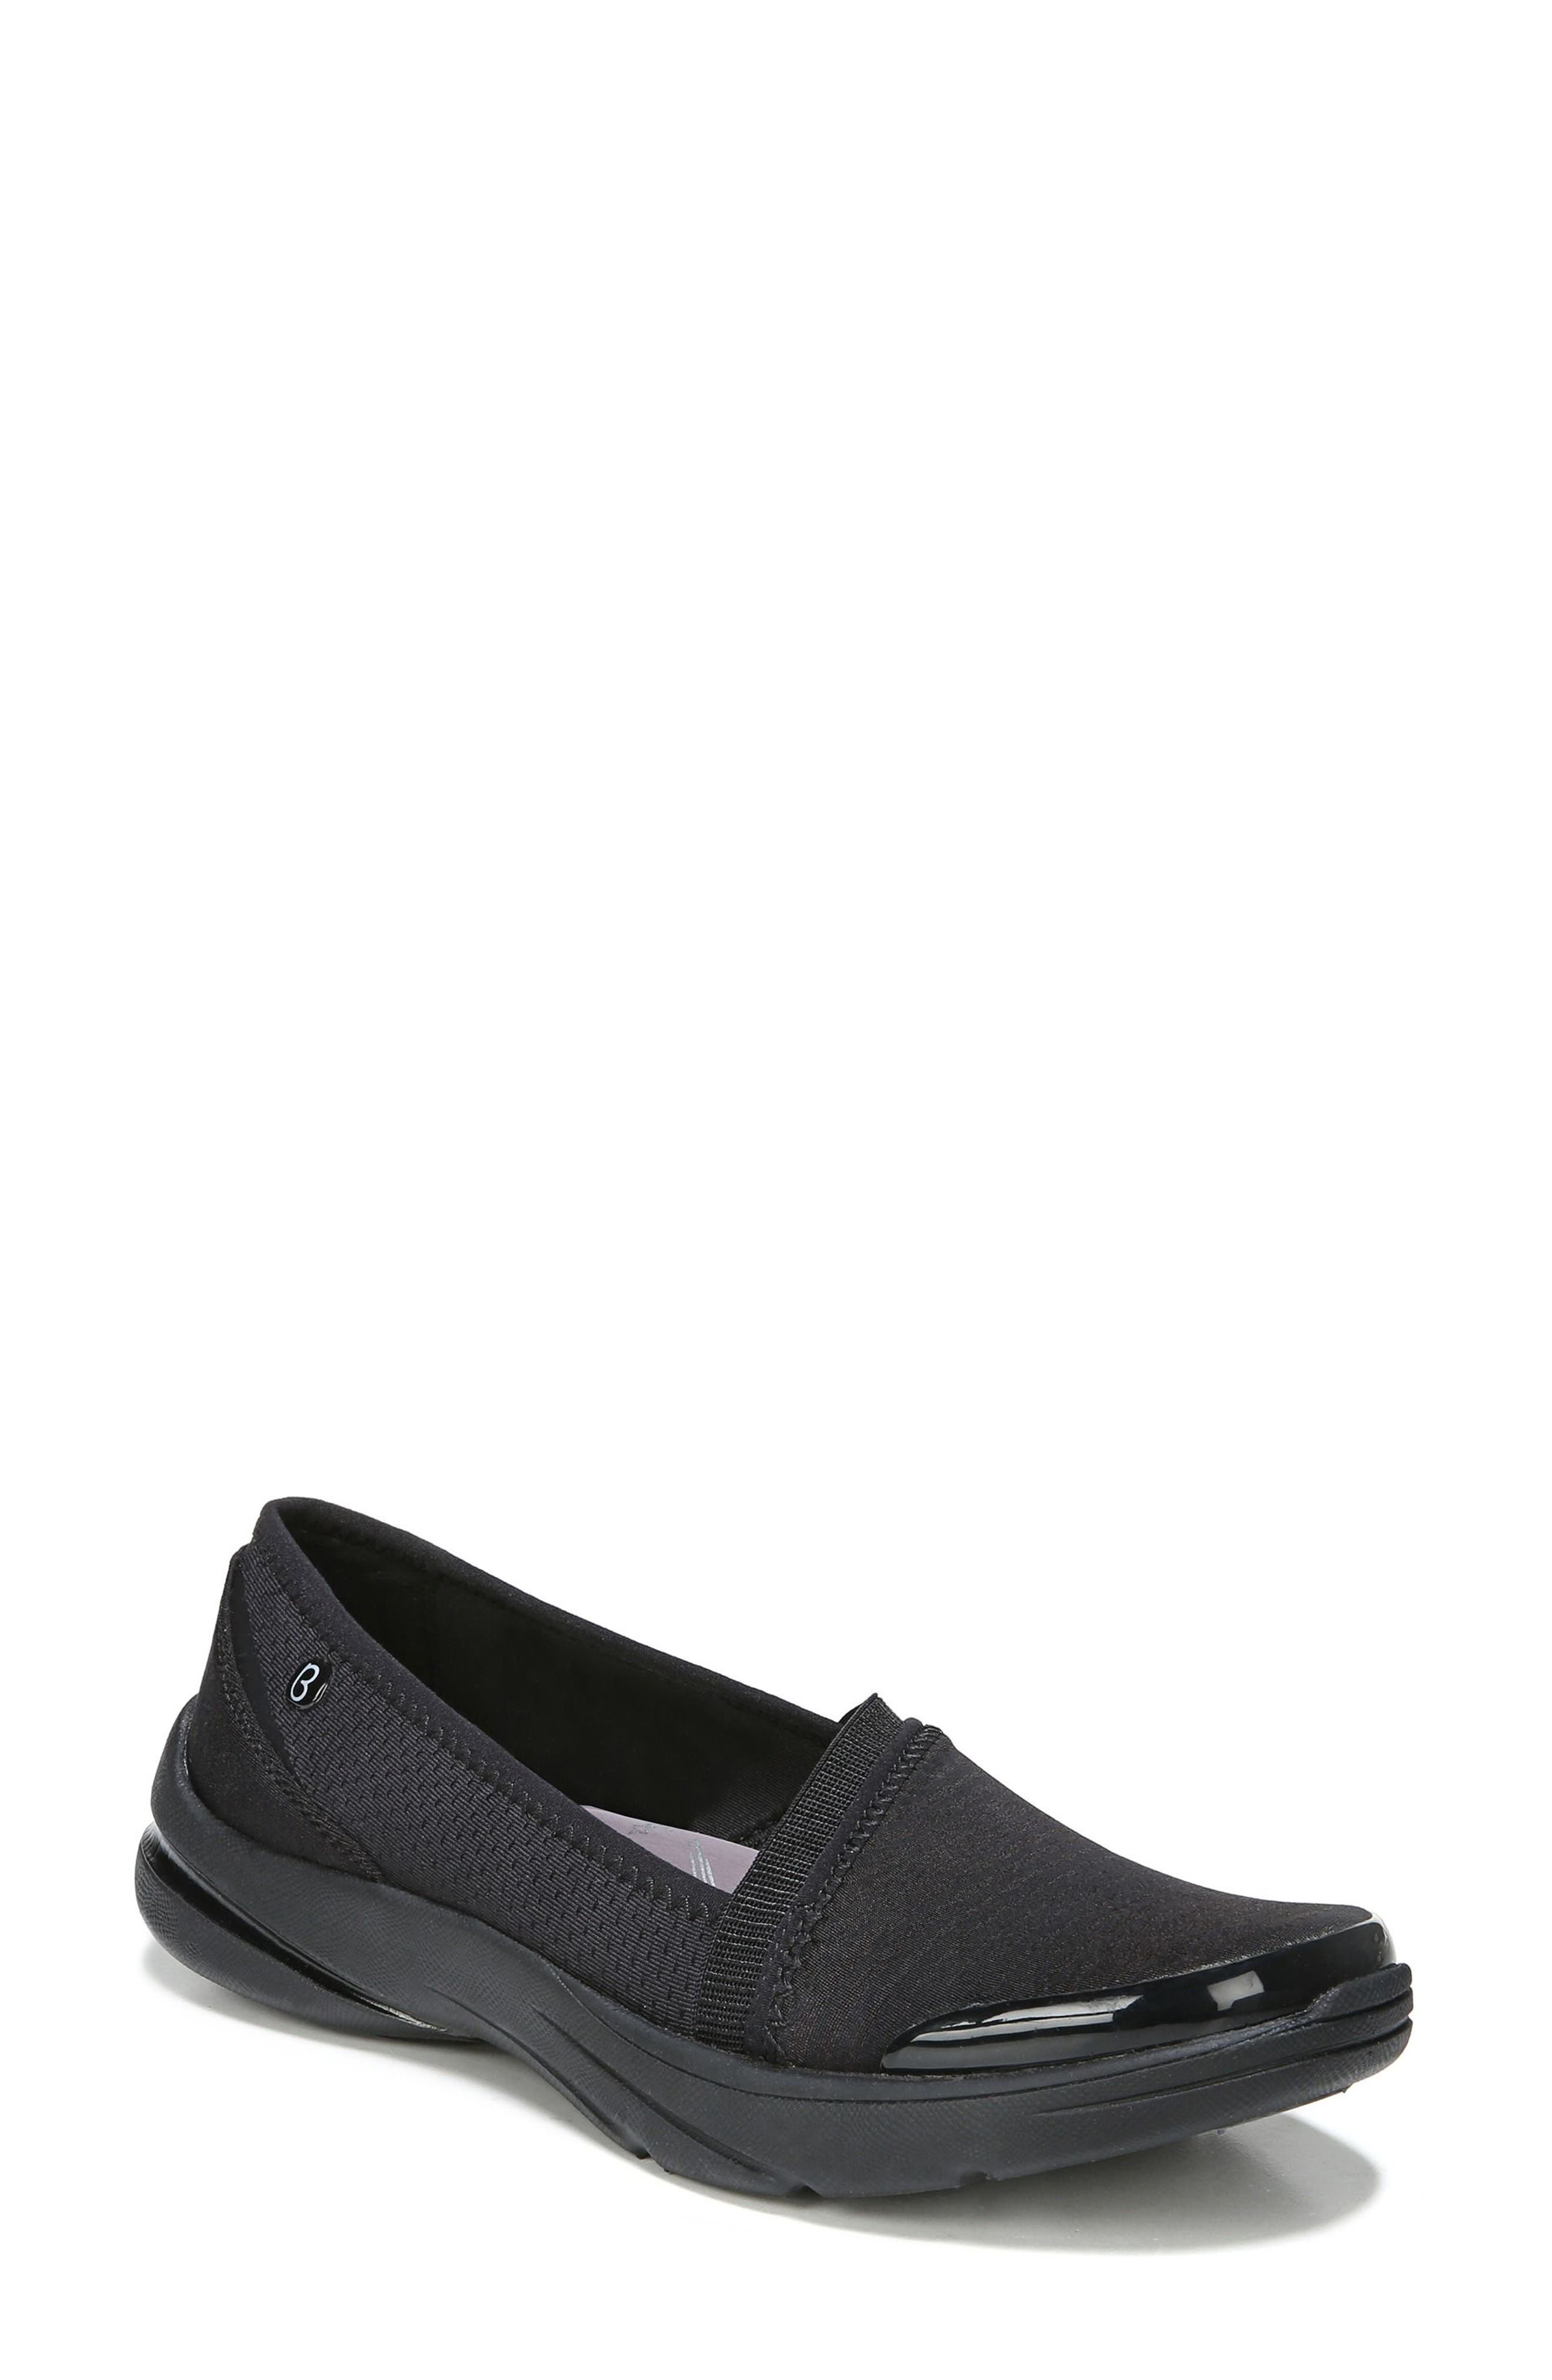 Lollipop Slip-On Sneaker,                         Main,                         color, BLACK FABRIC